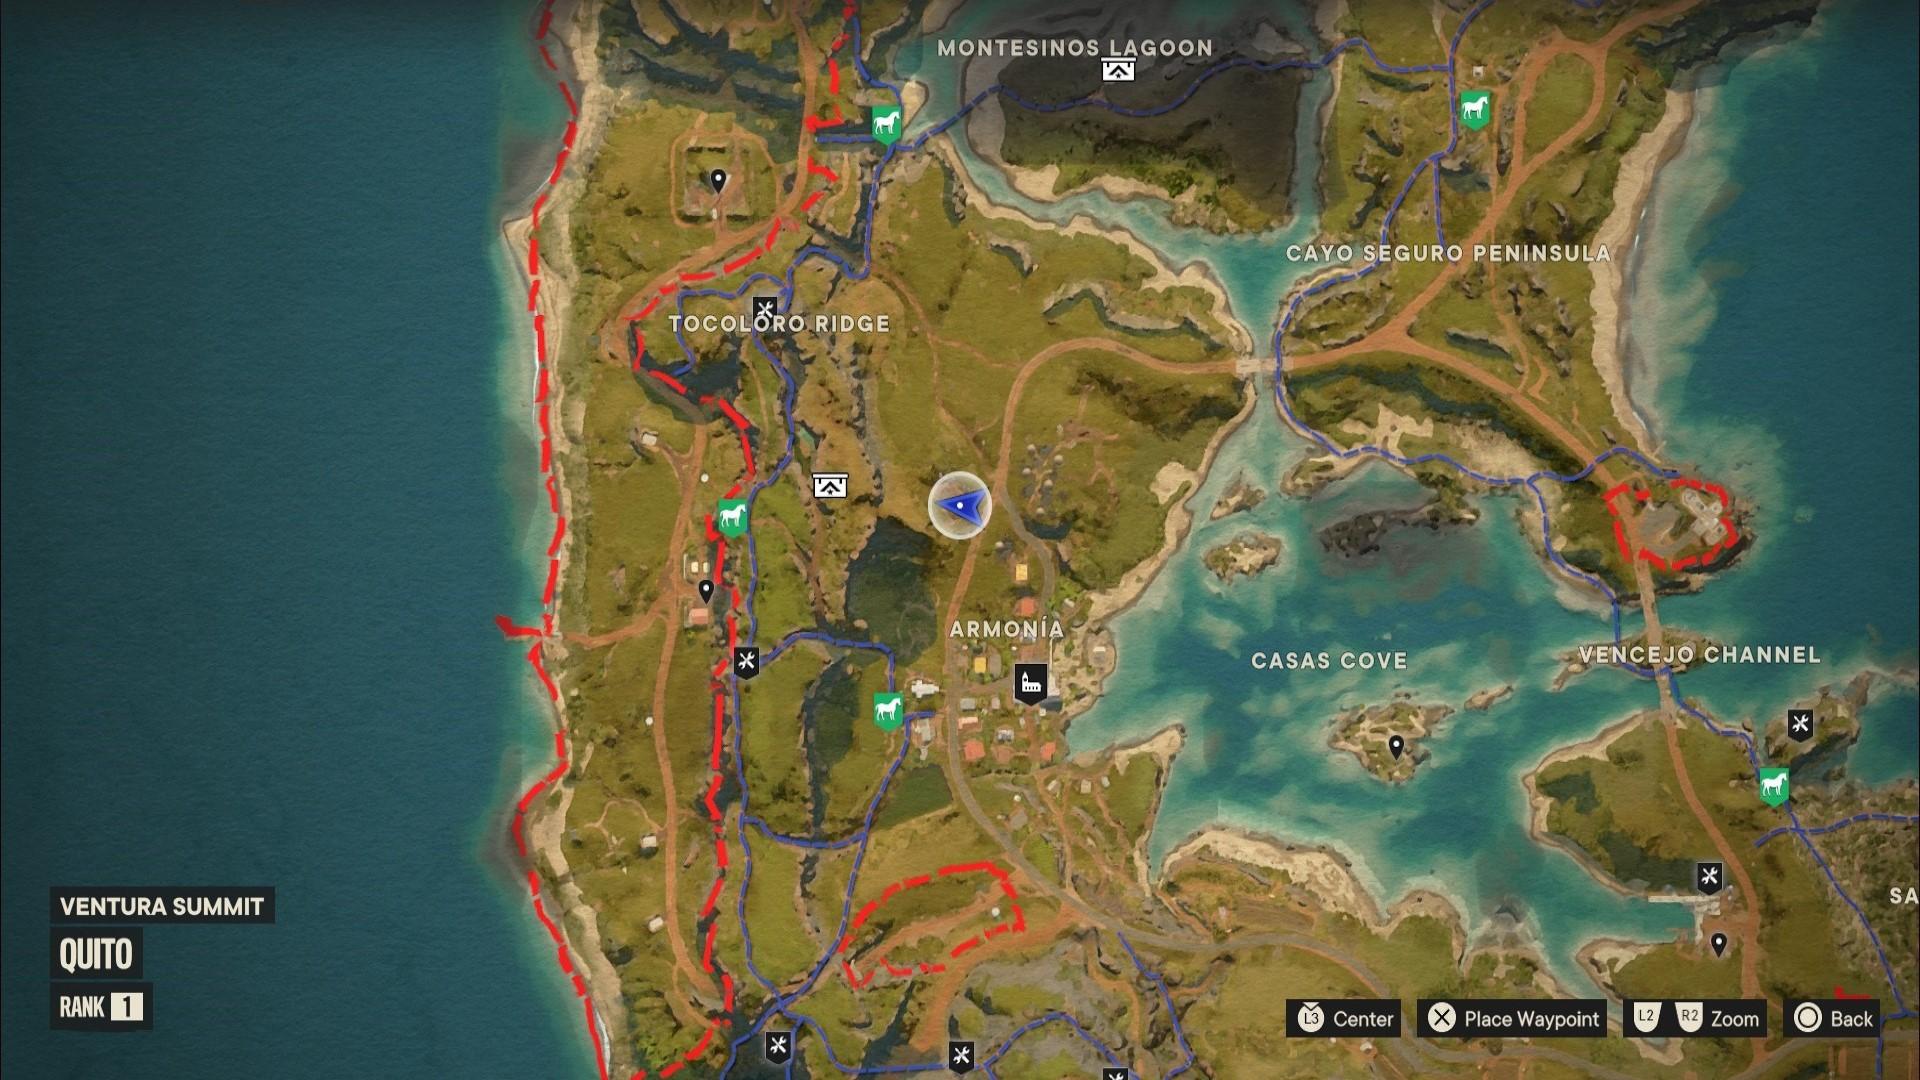 A Far Cry 6 Criptograma chest location marked on the map of Isla Santuario